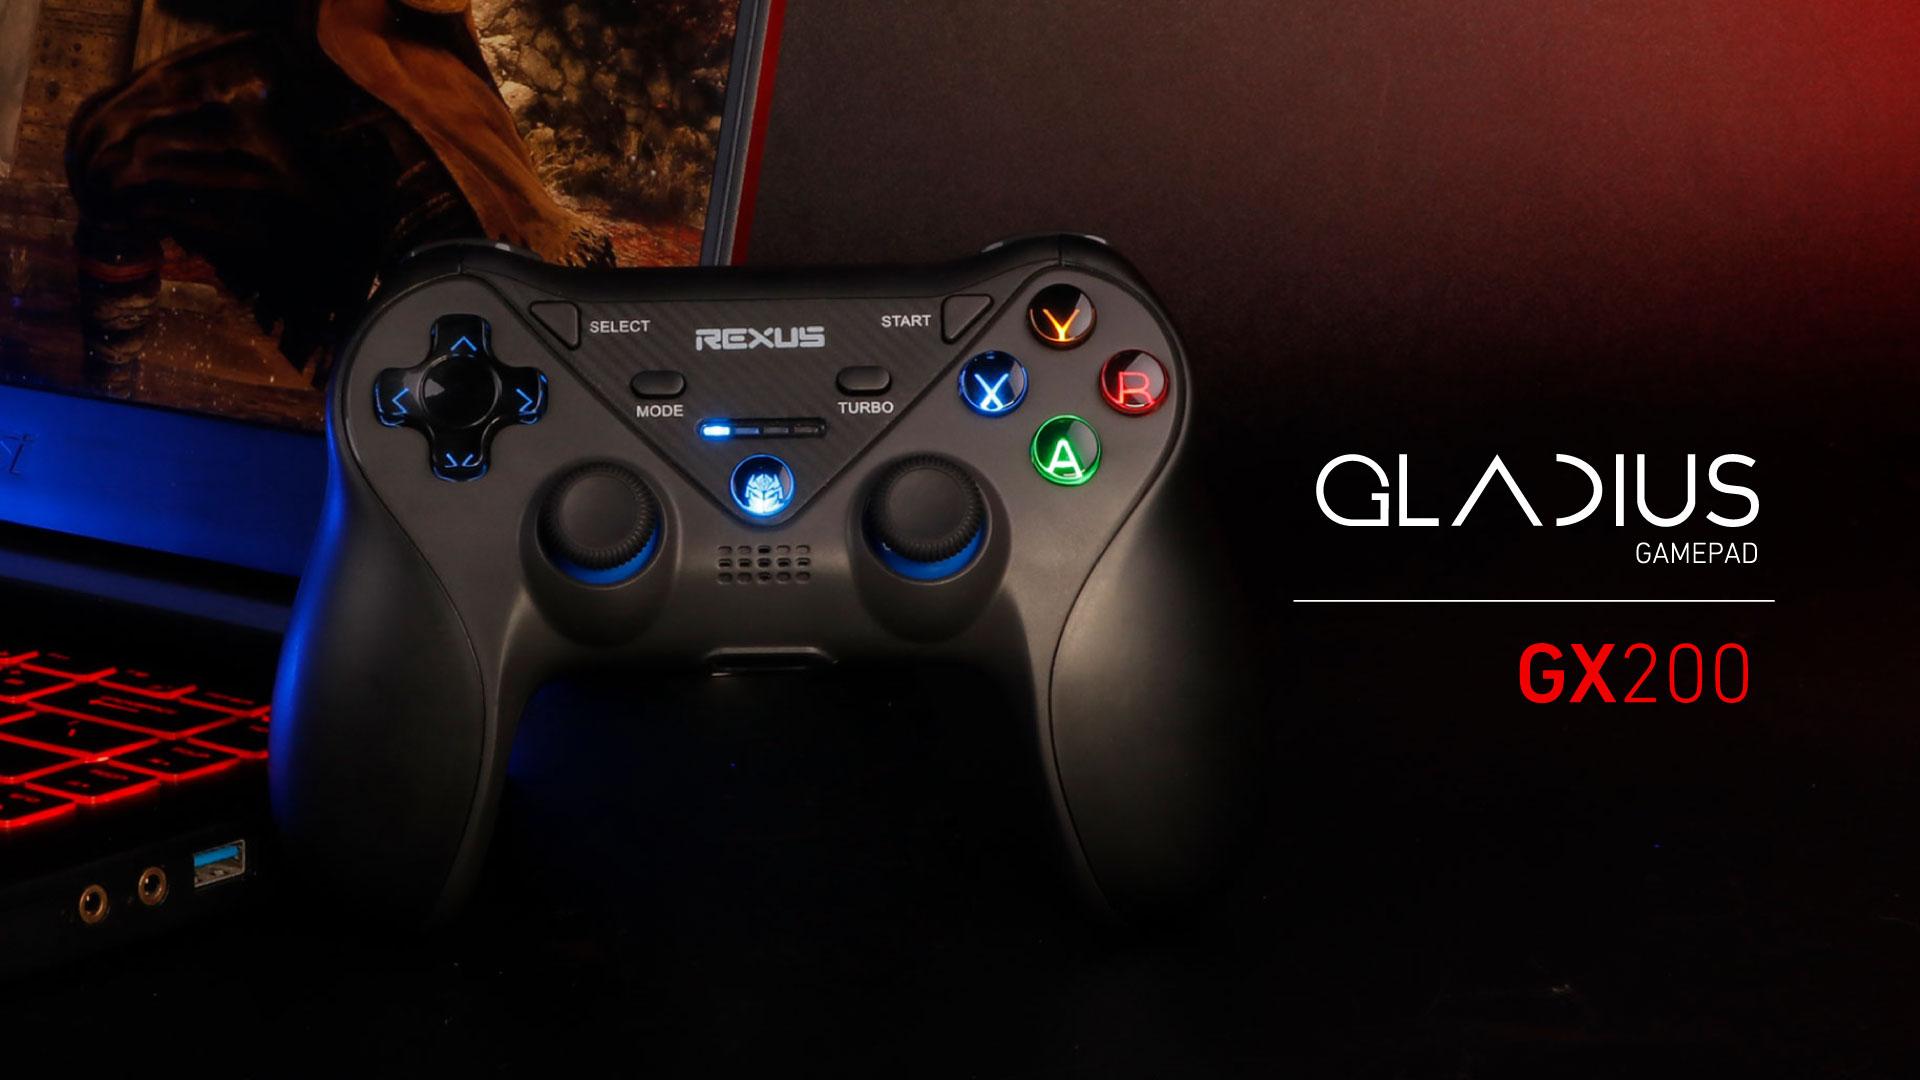 gamepad Rexus Gladius GX200 WL GX200 1920x1080